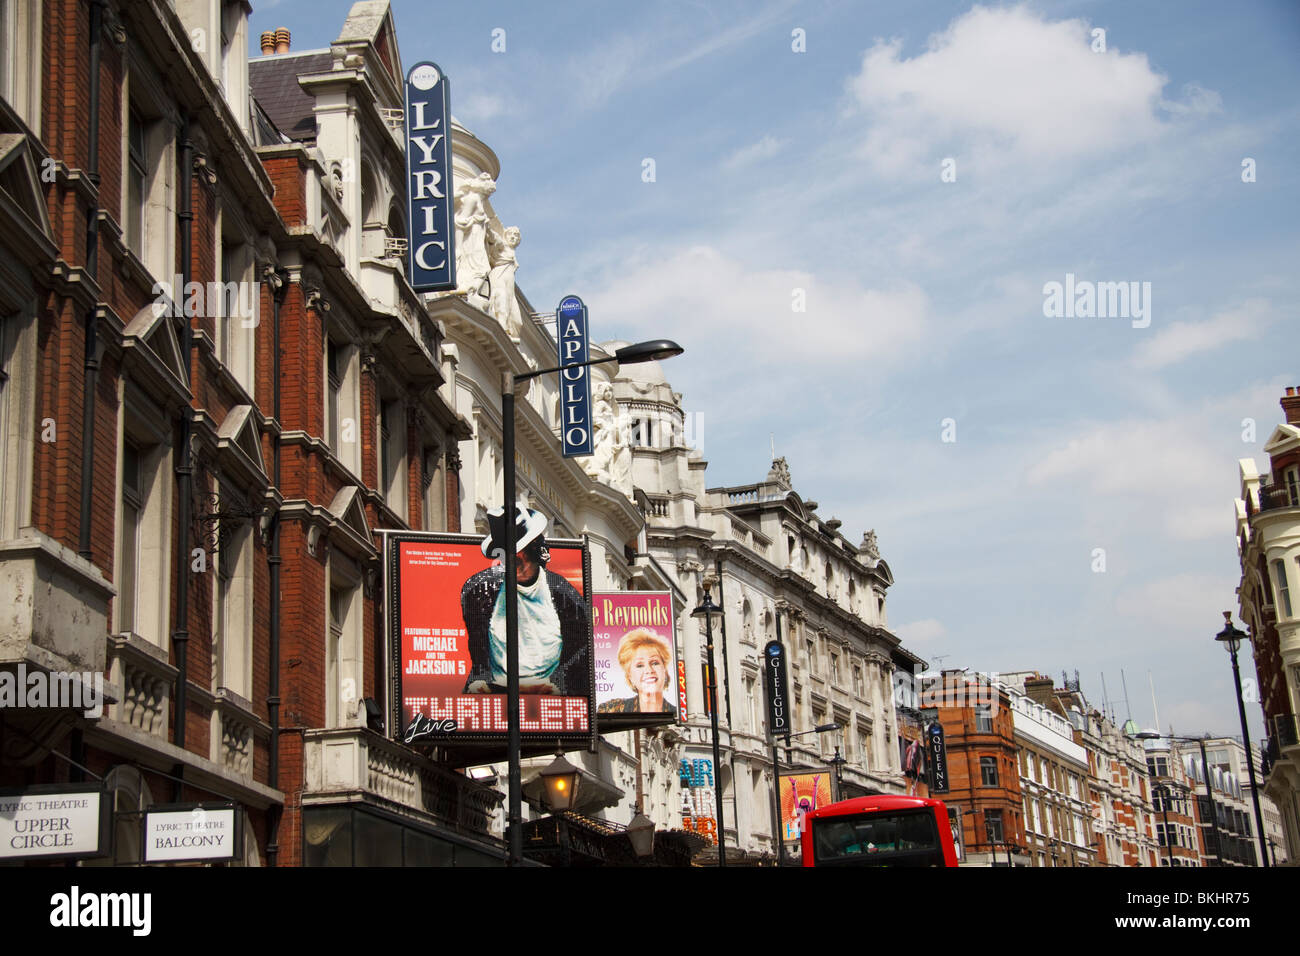 Londons West End, Theatreland, Shaftesbury Avenue, London, England, UK - Stock Image